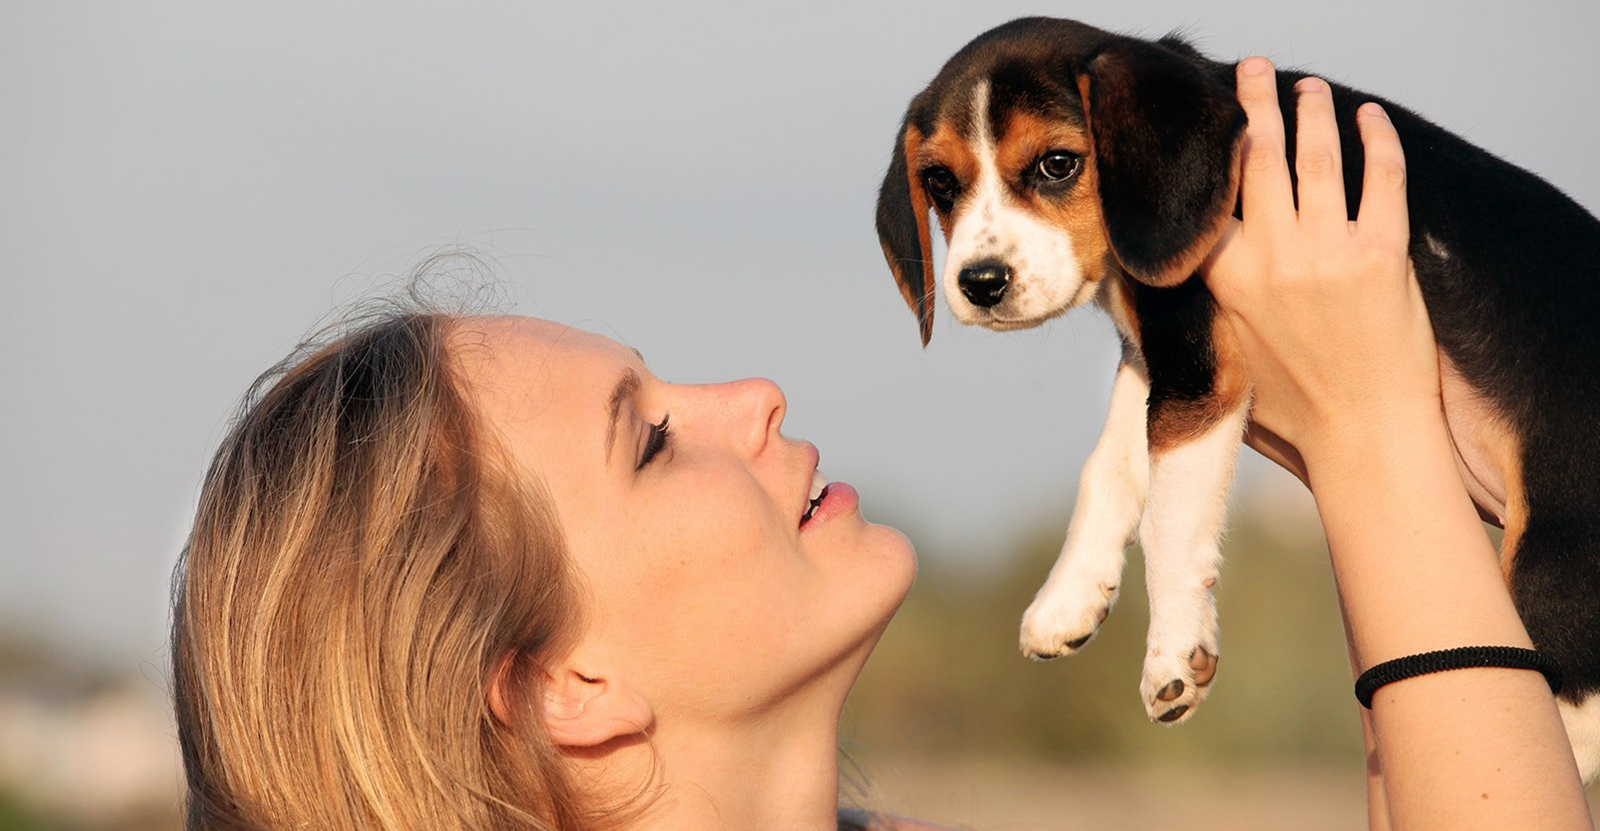 Frau hält ein Hundewelpen